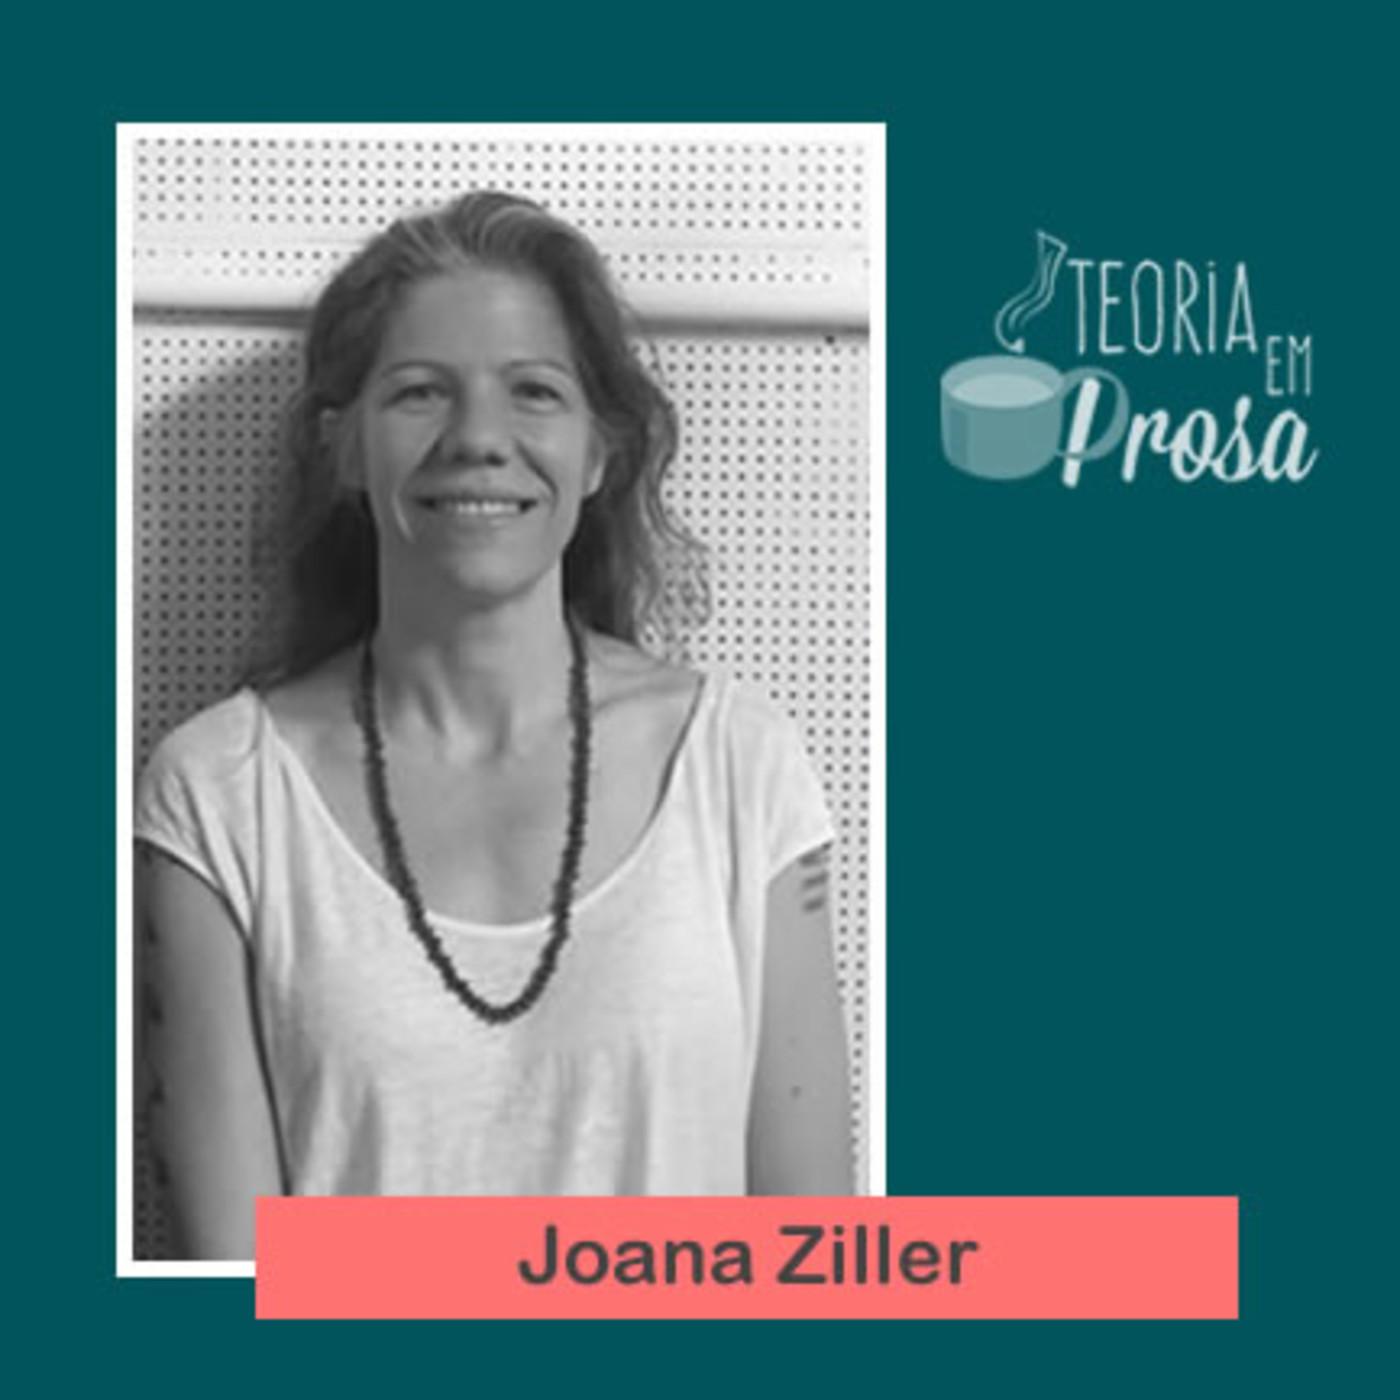 #10 Teoria em Prosa - Joana Ziller